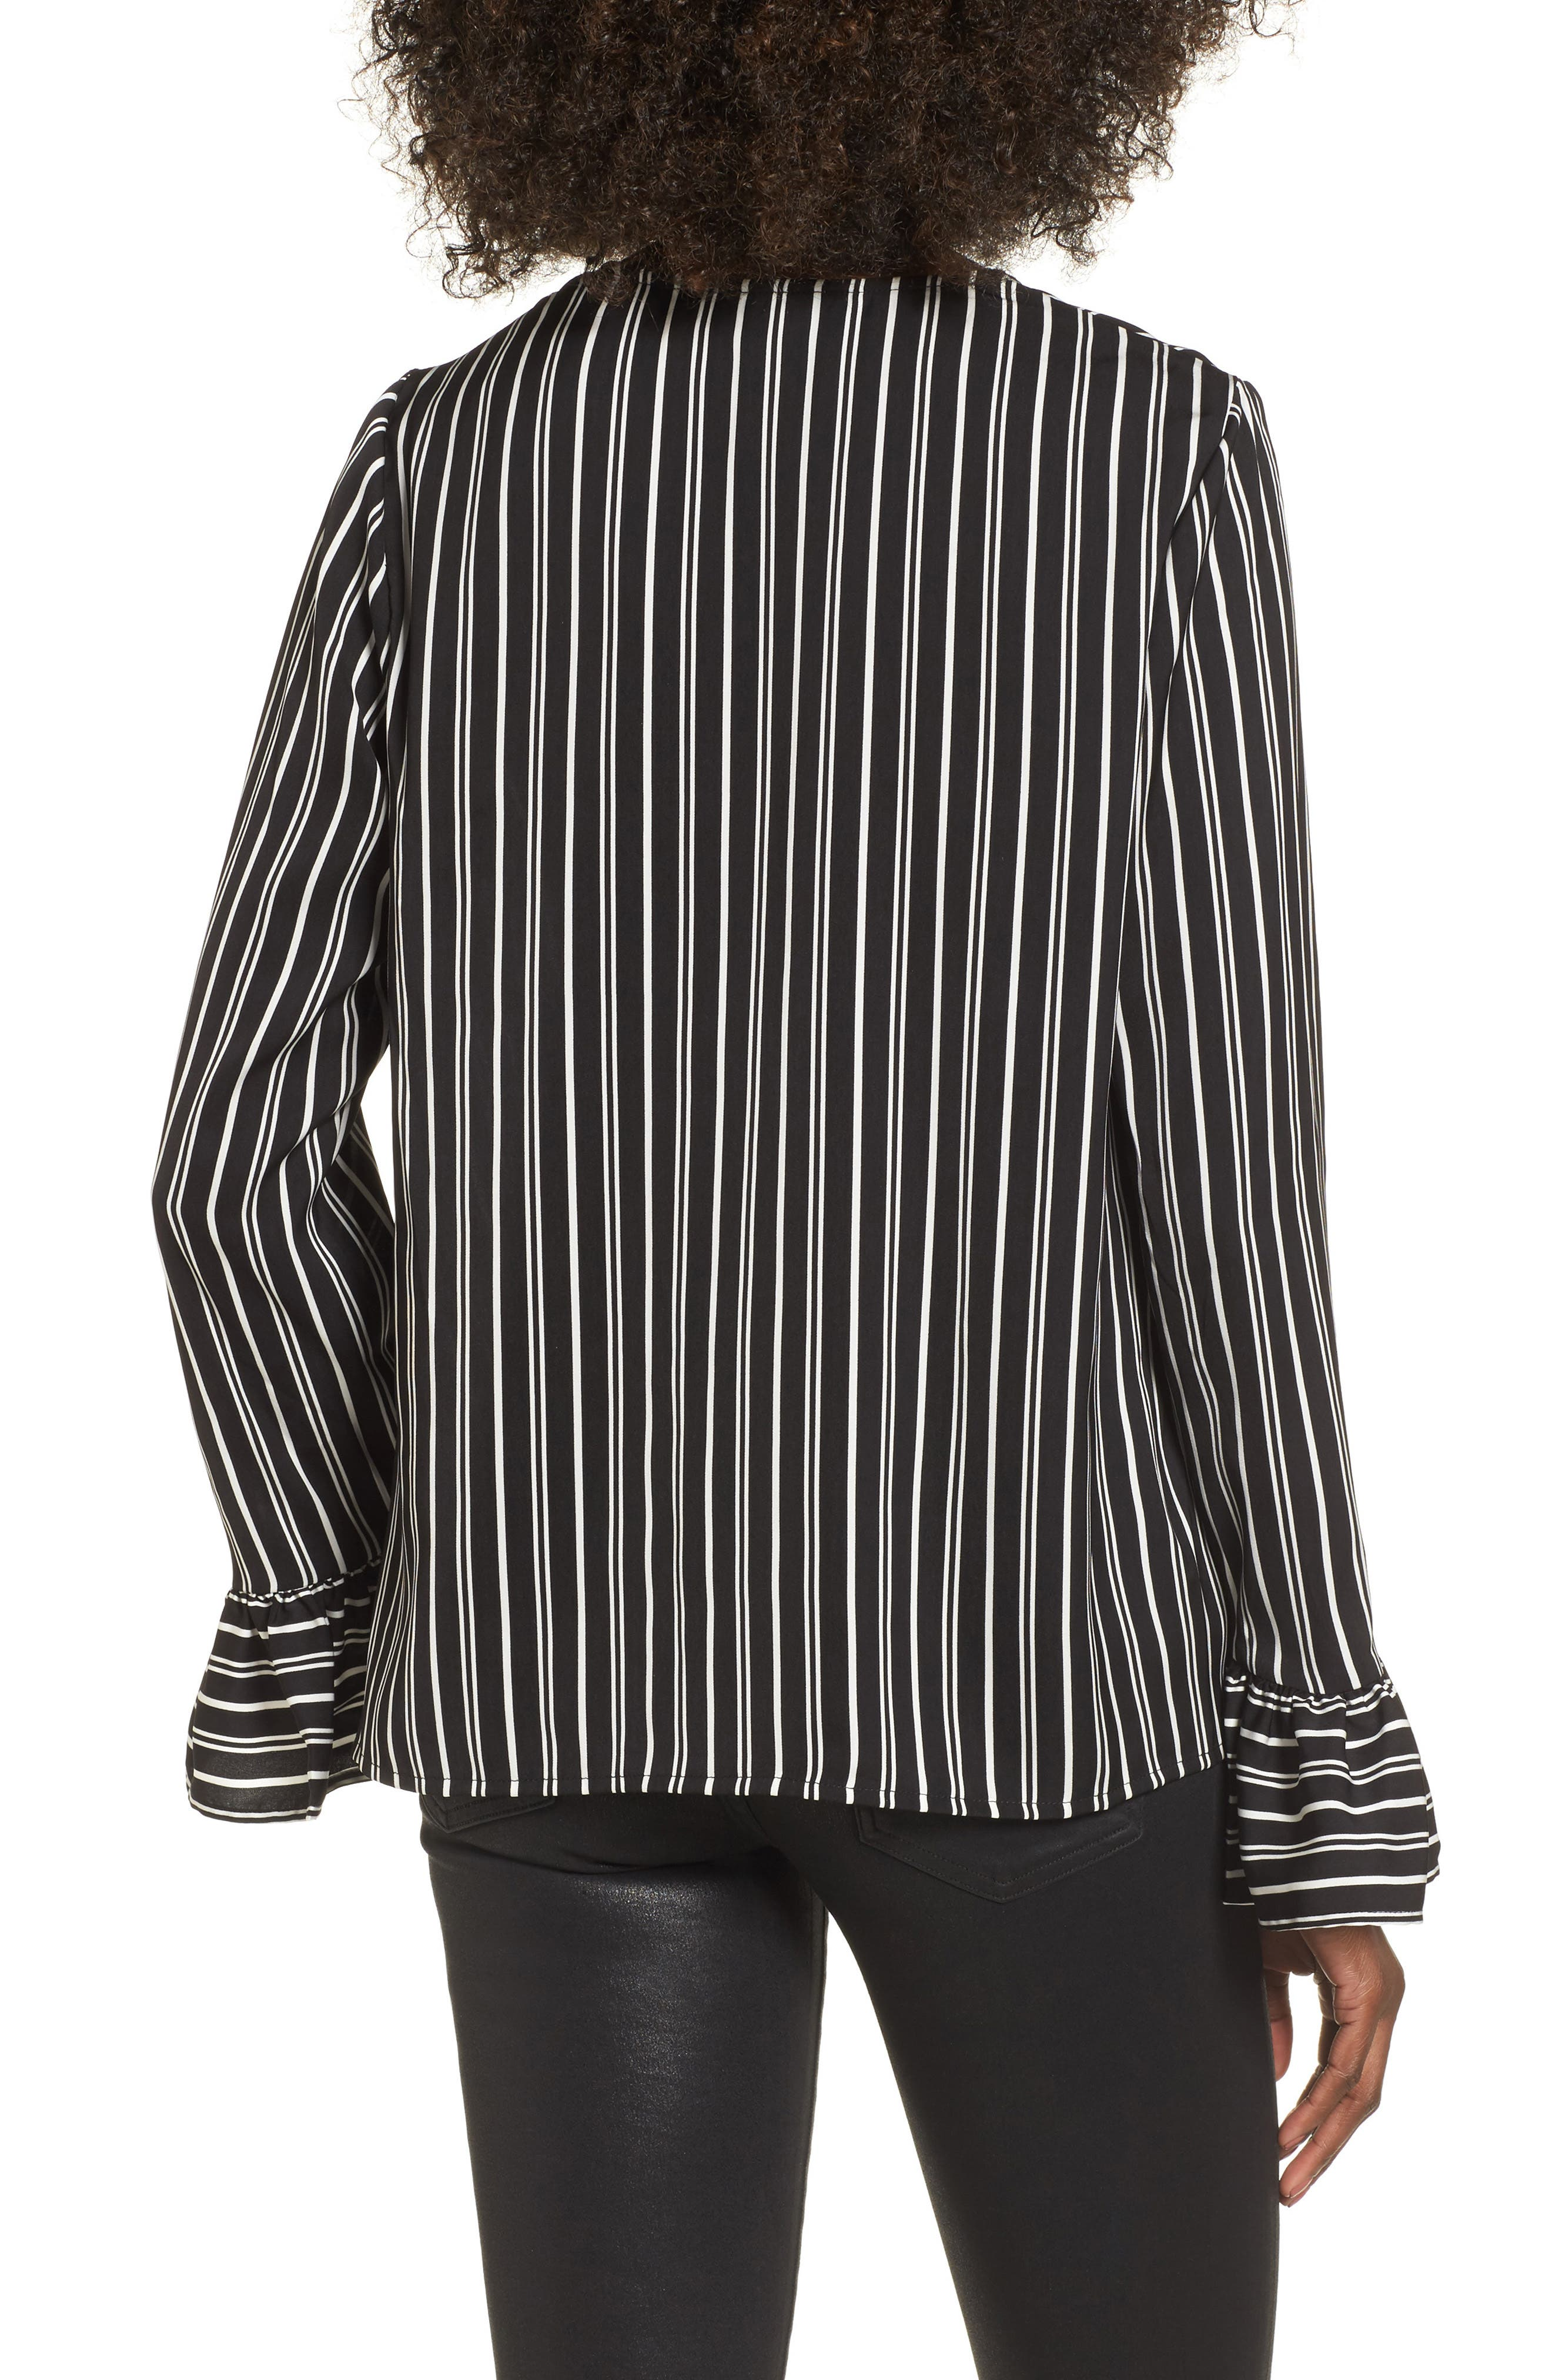 Ophelia Stripe Flare Cuff Top,                             Alternate thumbnail 2, color,                             Black W/ Ivory